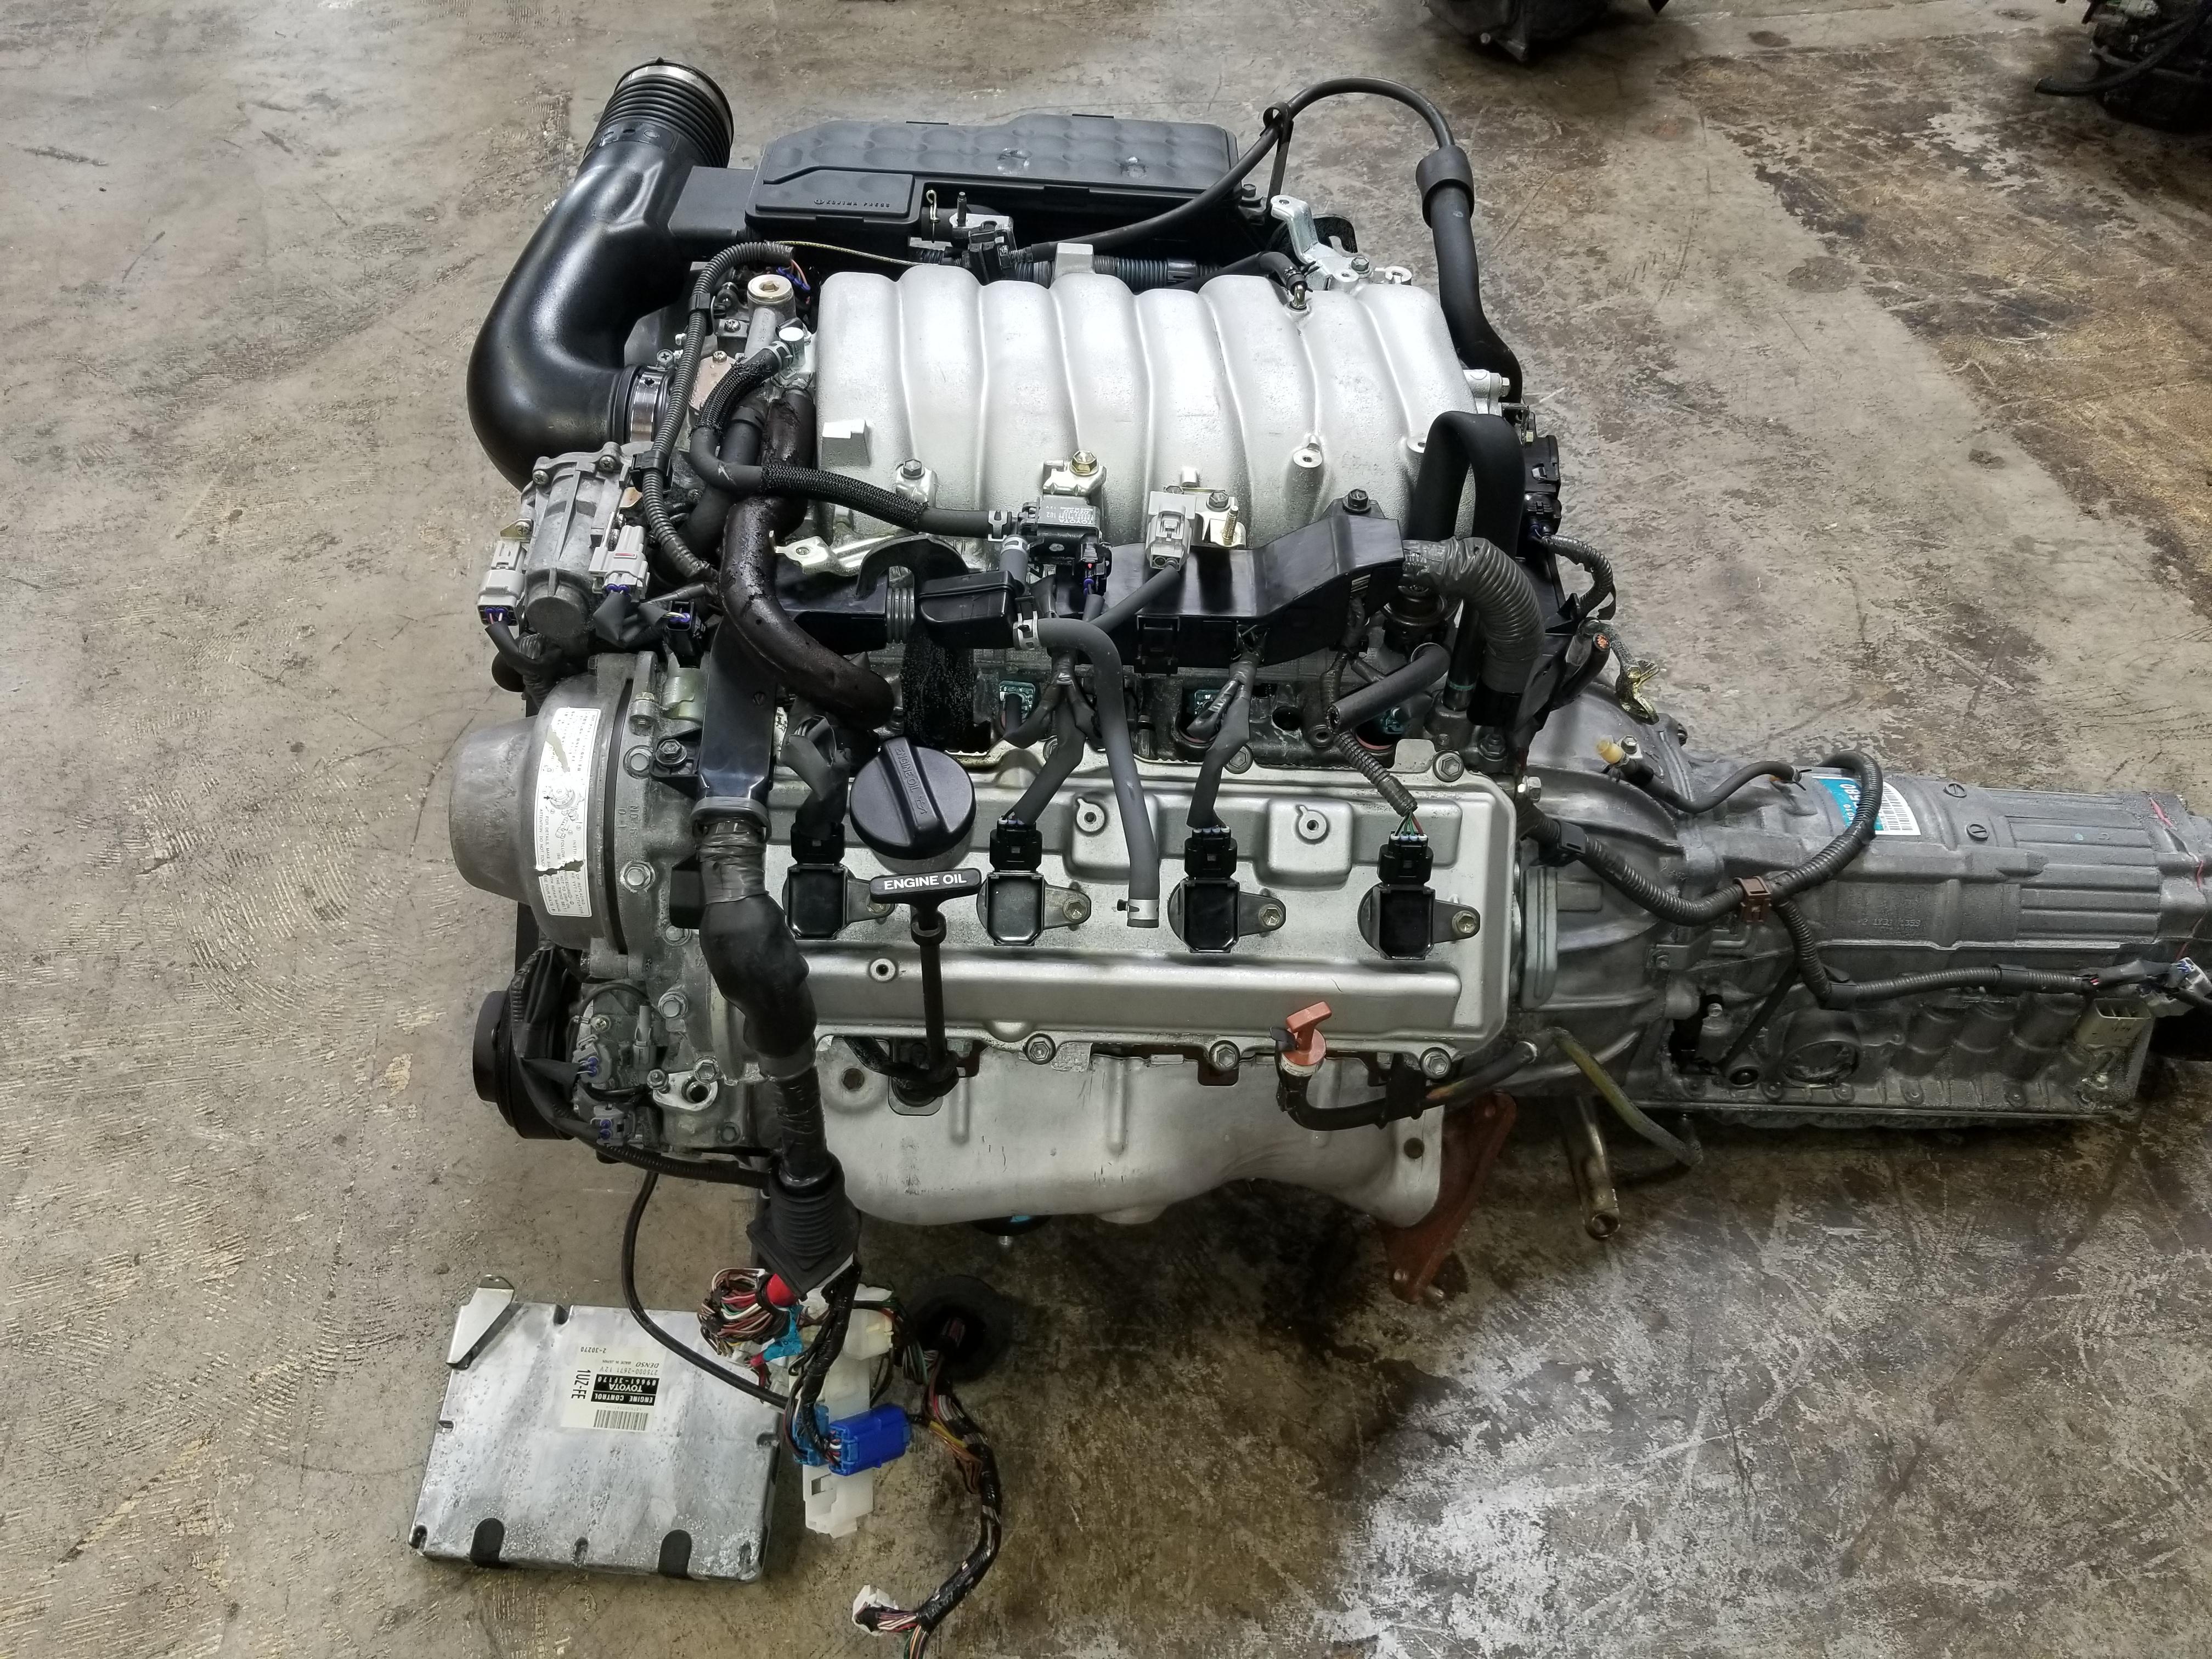 1uz – 1998 2000 Lexus SC400 LS400 4 0L Engine JDM 1UZ-FE VVTi V8 Motor  Toyota 1UZ